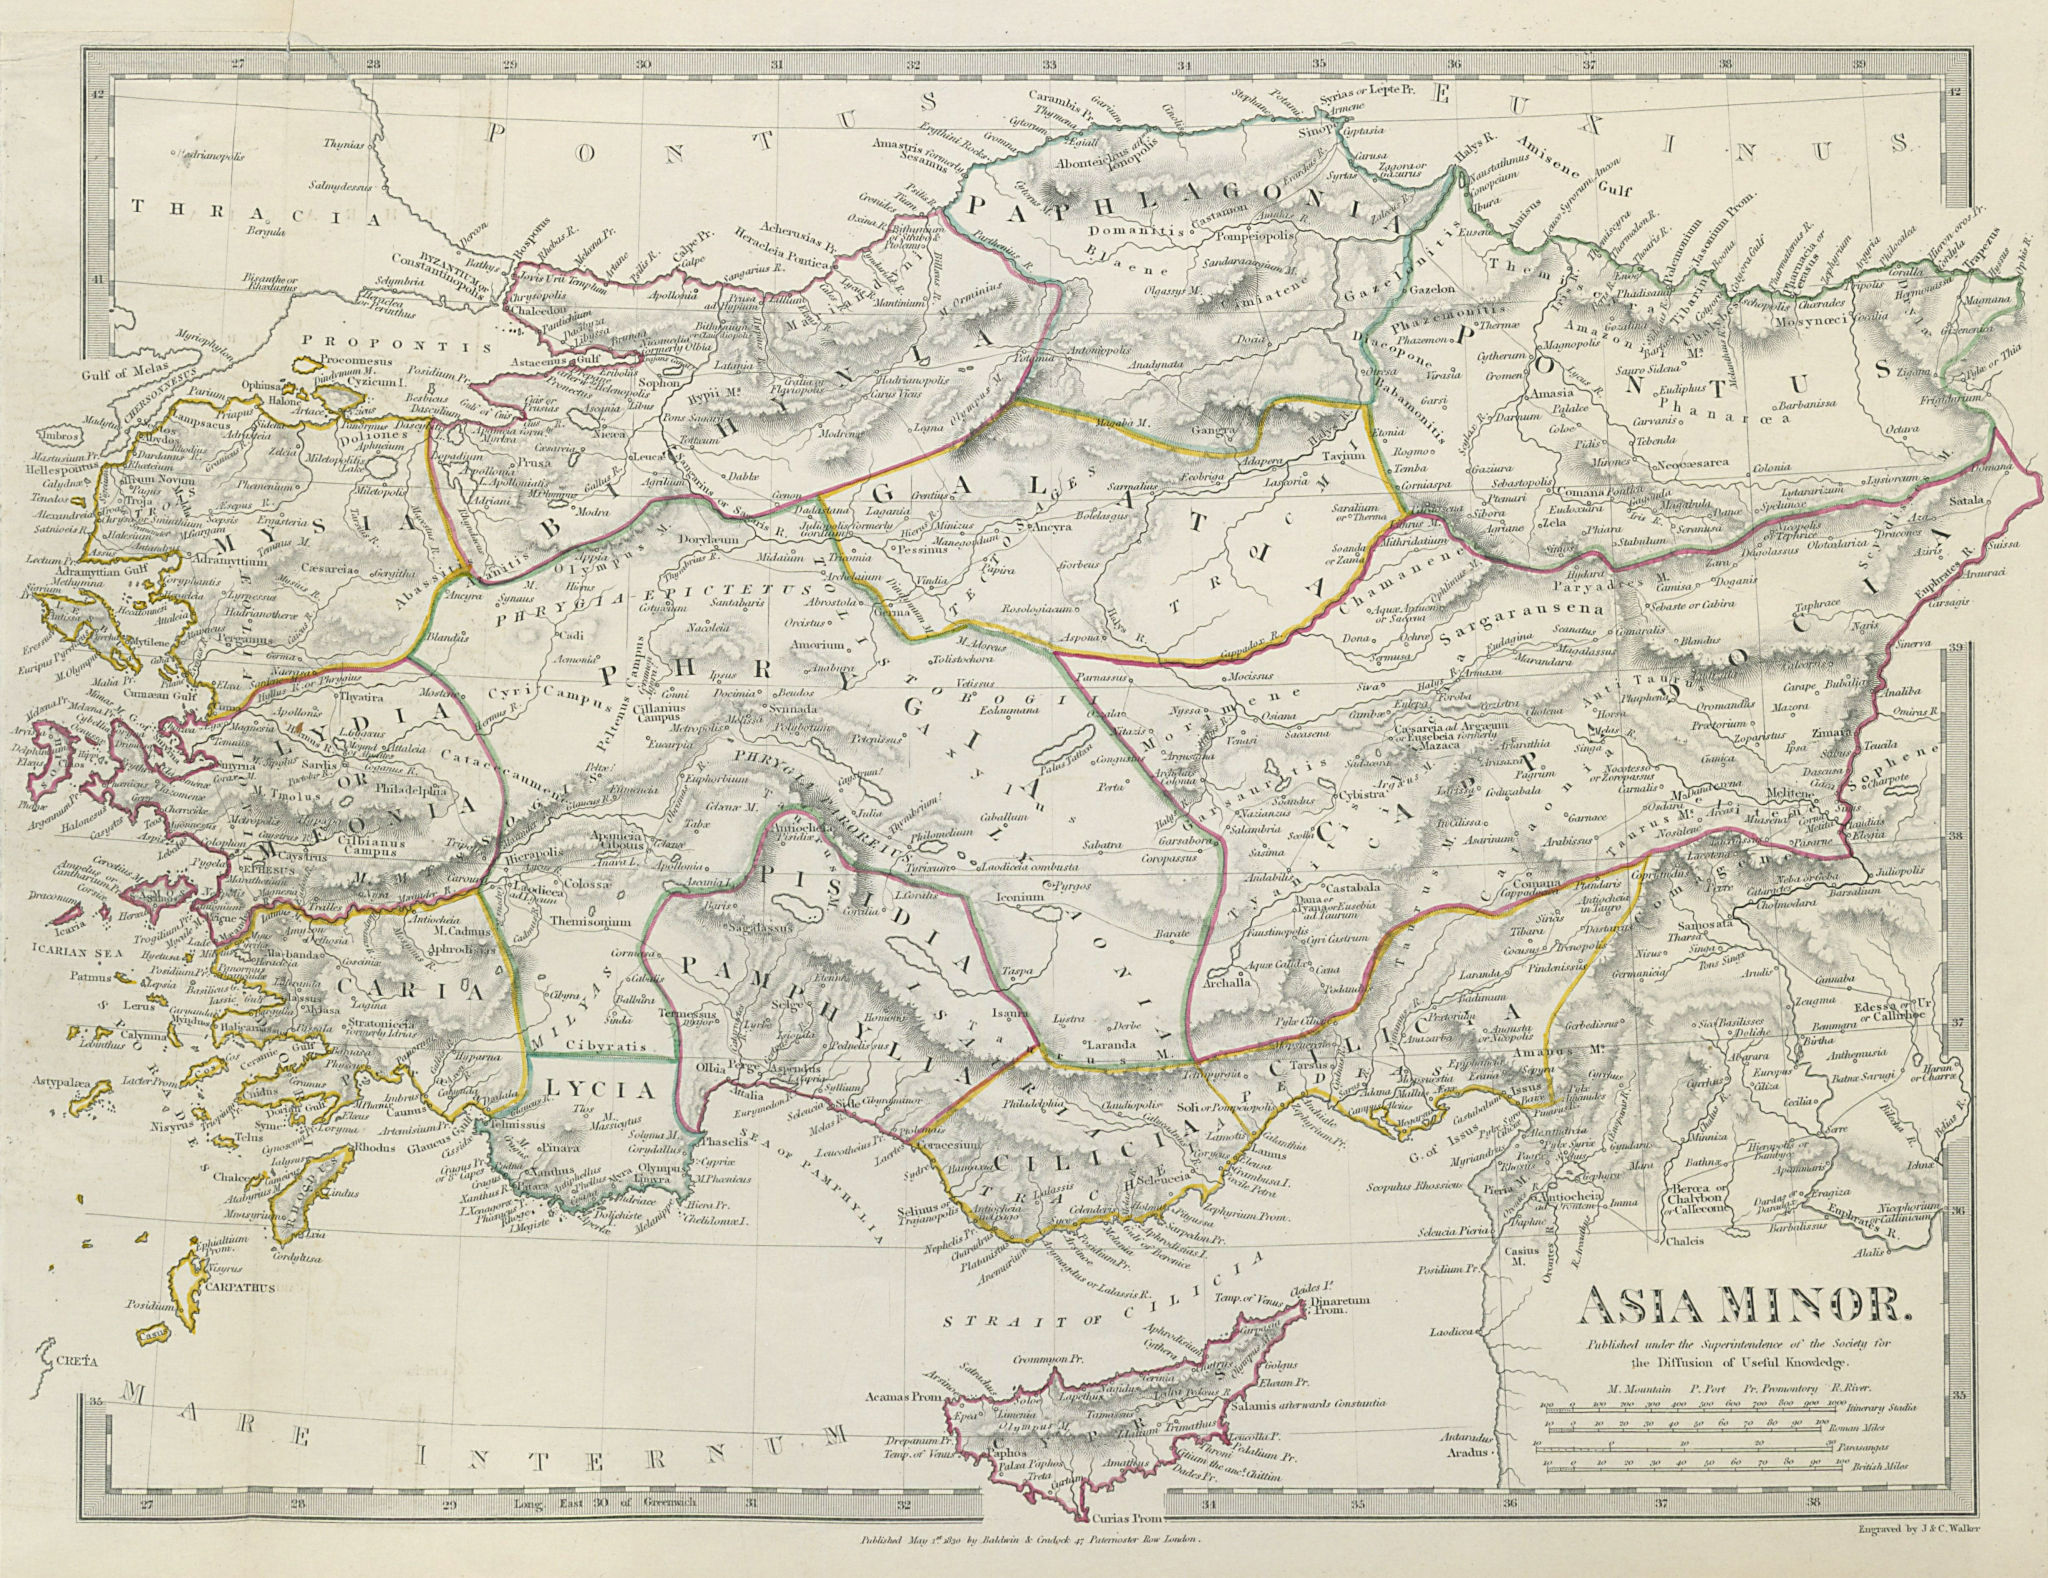 ANCIENT ASIA MINOR Turkey Cyprus Cappadocia Galatia Phrygia SDUK 1844 old map